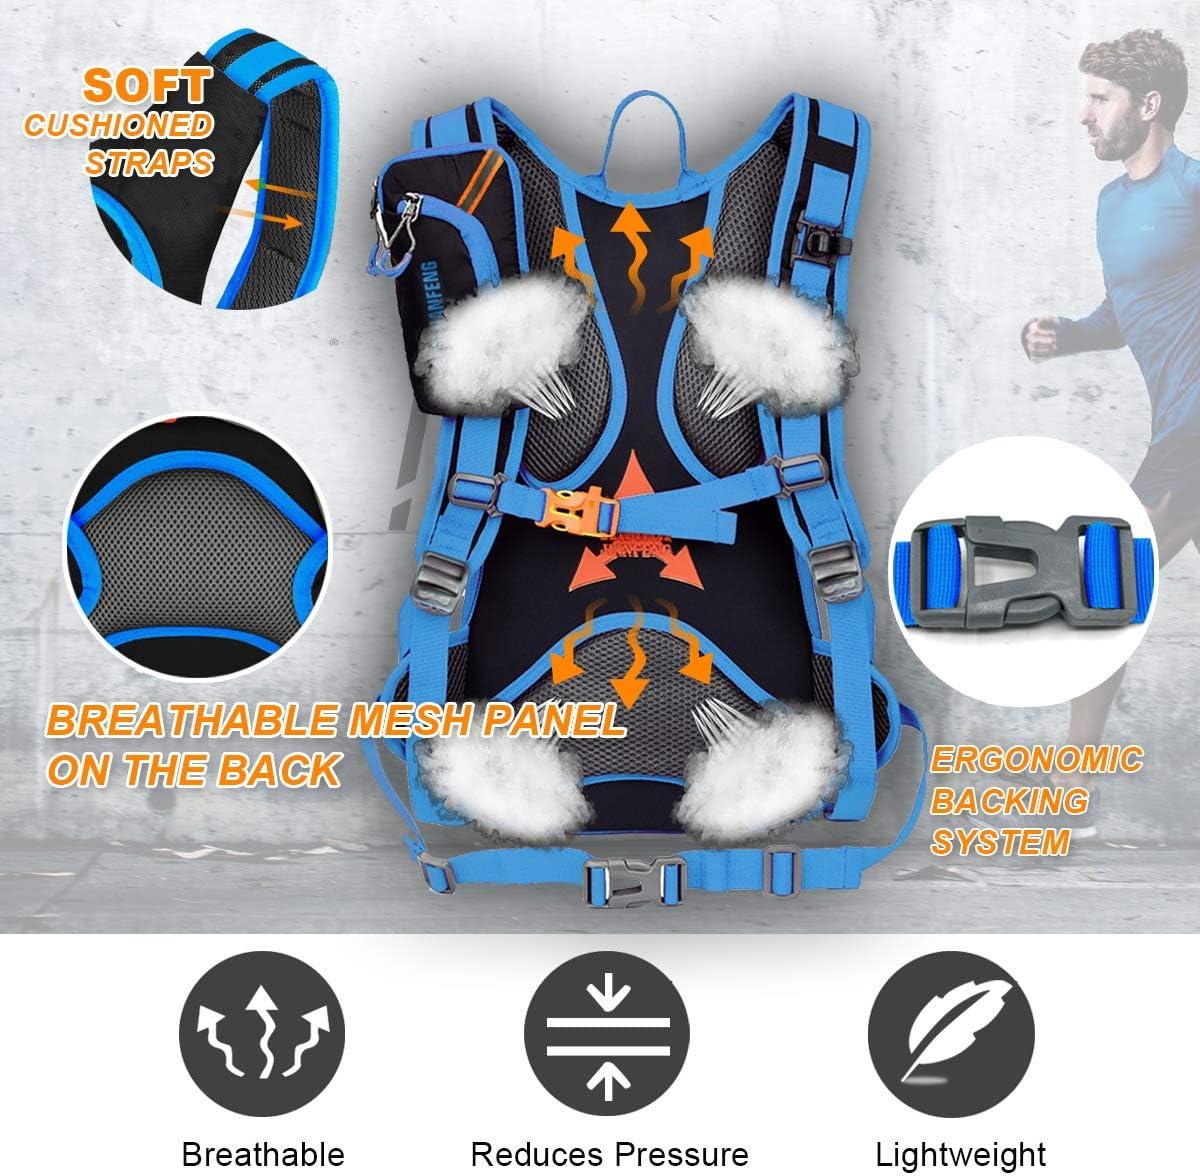 Keethem Mochila de Ciclismo 18L Impermeable para Excursionismo Ciclismo Alpinismo Senderismo Camping al Aire Libre con 2 mosquetones Gratis